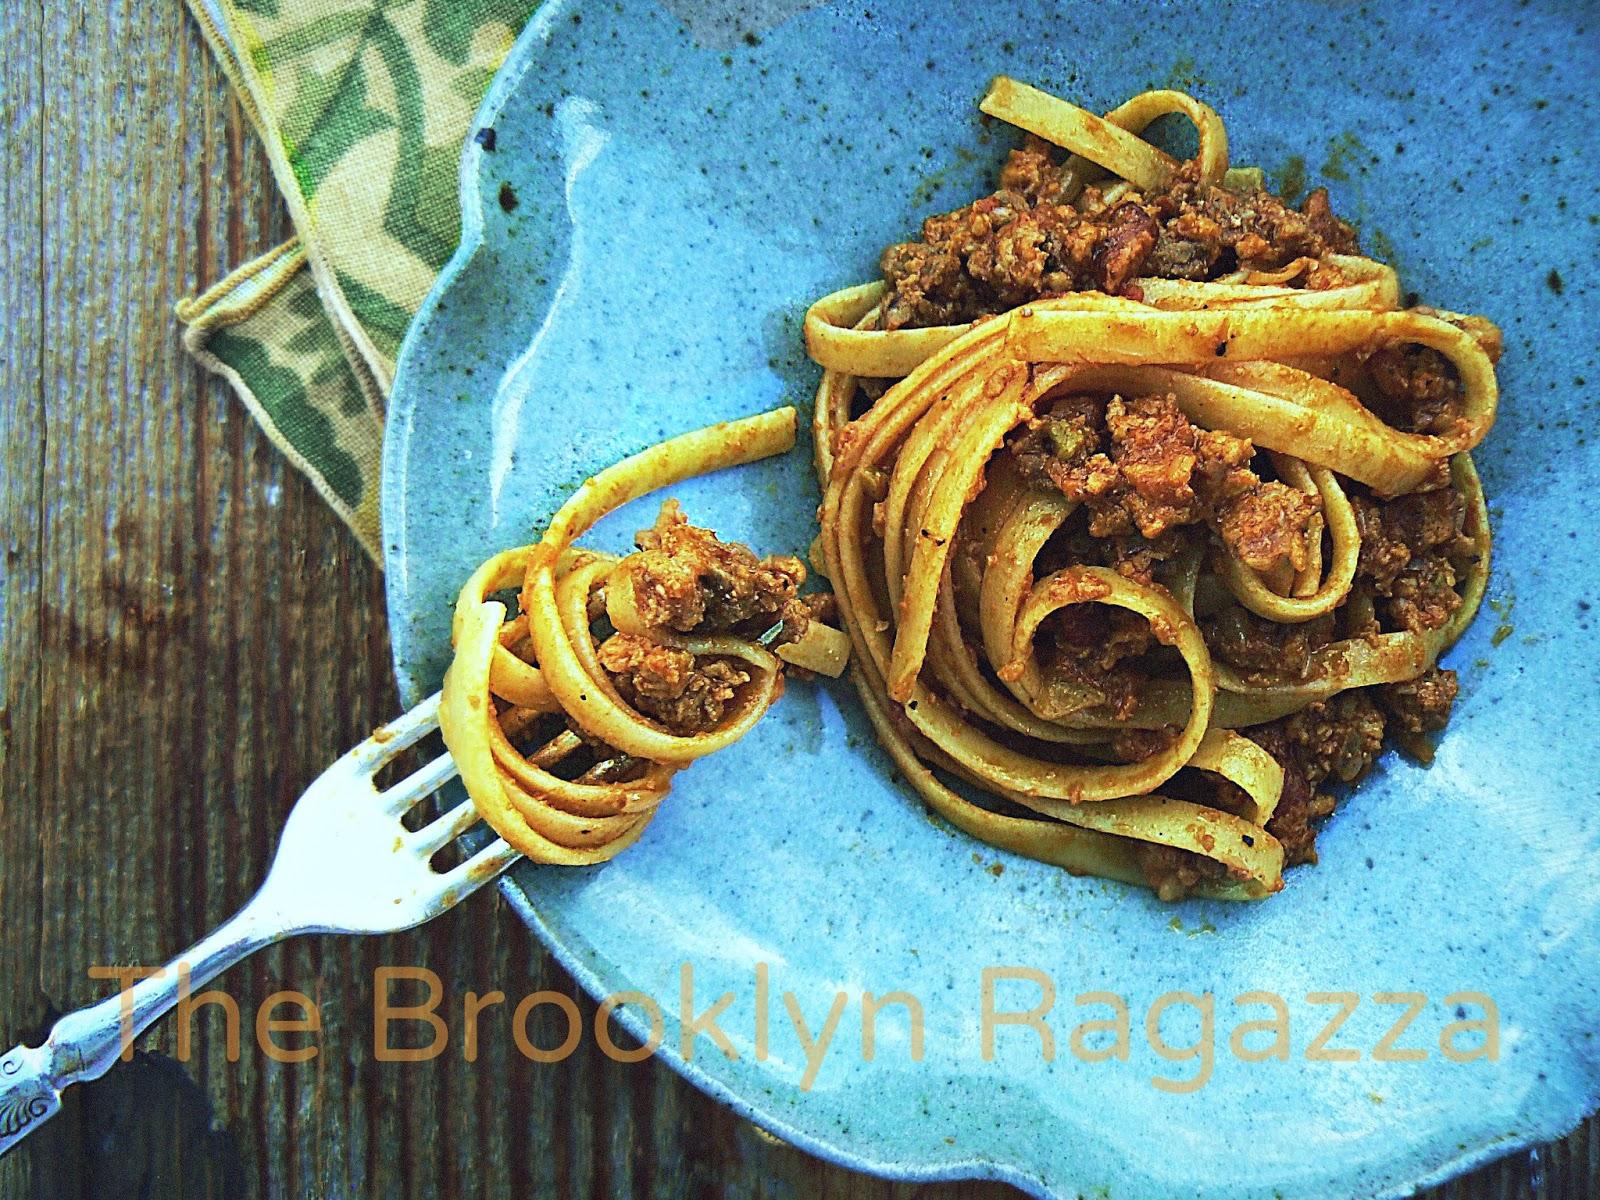 The Brooklyn Ragazza: Fettuccini with Smoky Sausage Ragu Bolognese